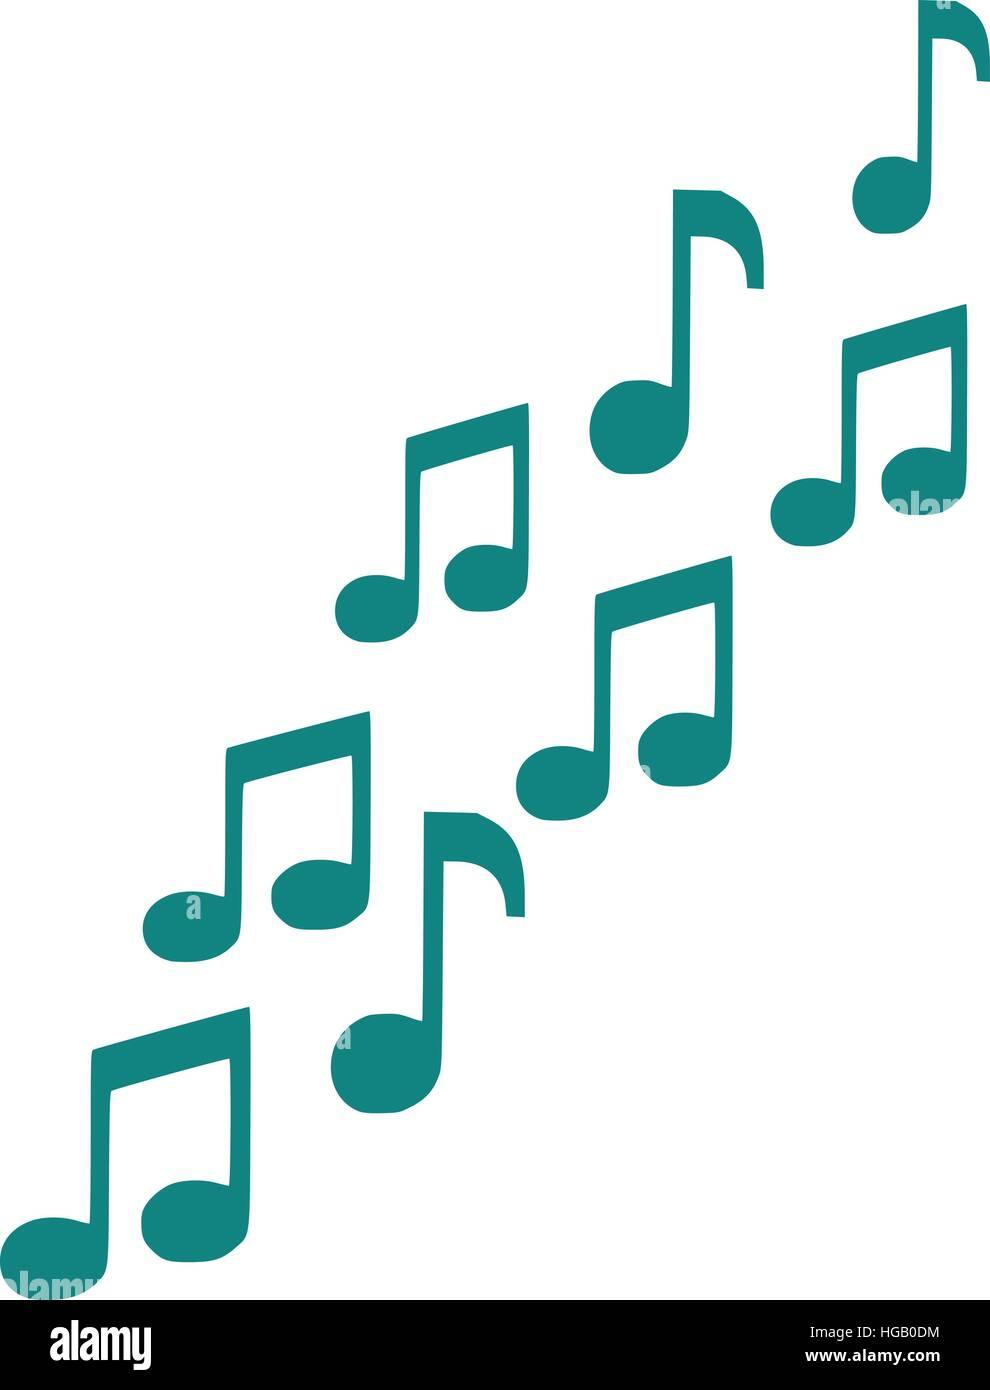 Music notes symbol stock vector art illustration vector image music notes symbol buycottarizona